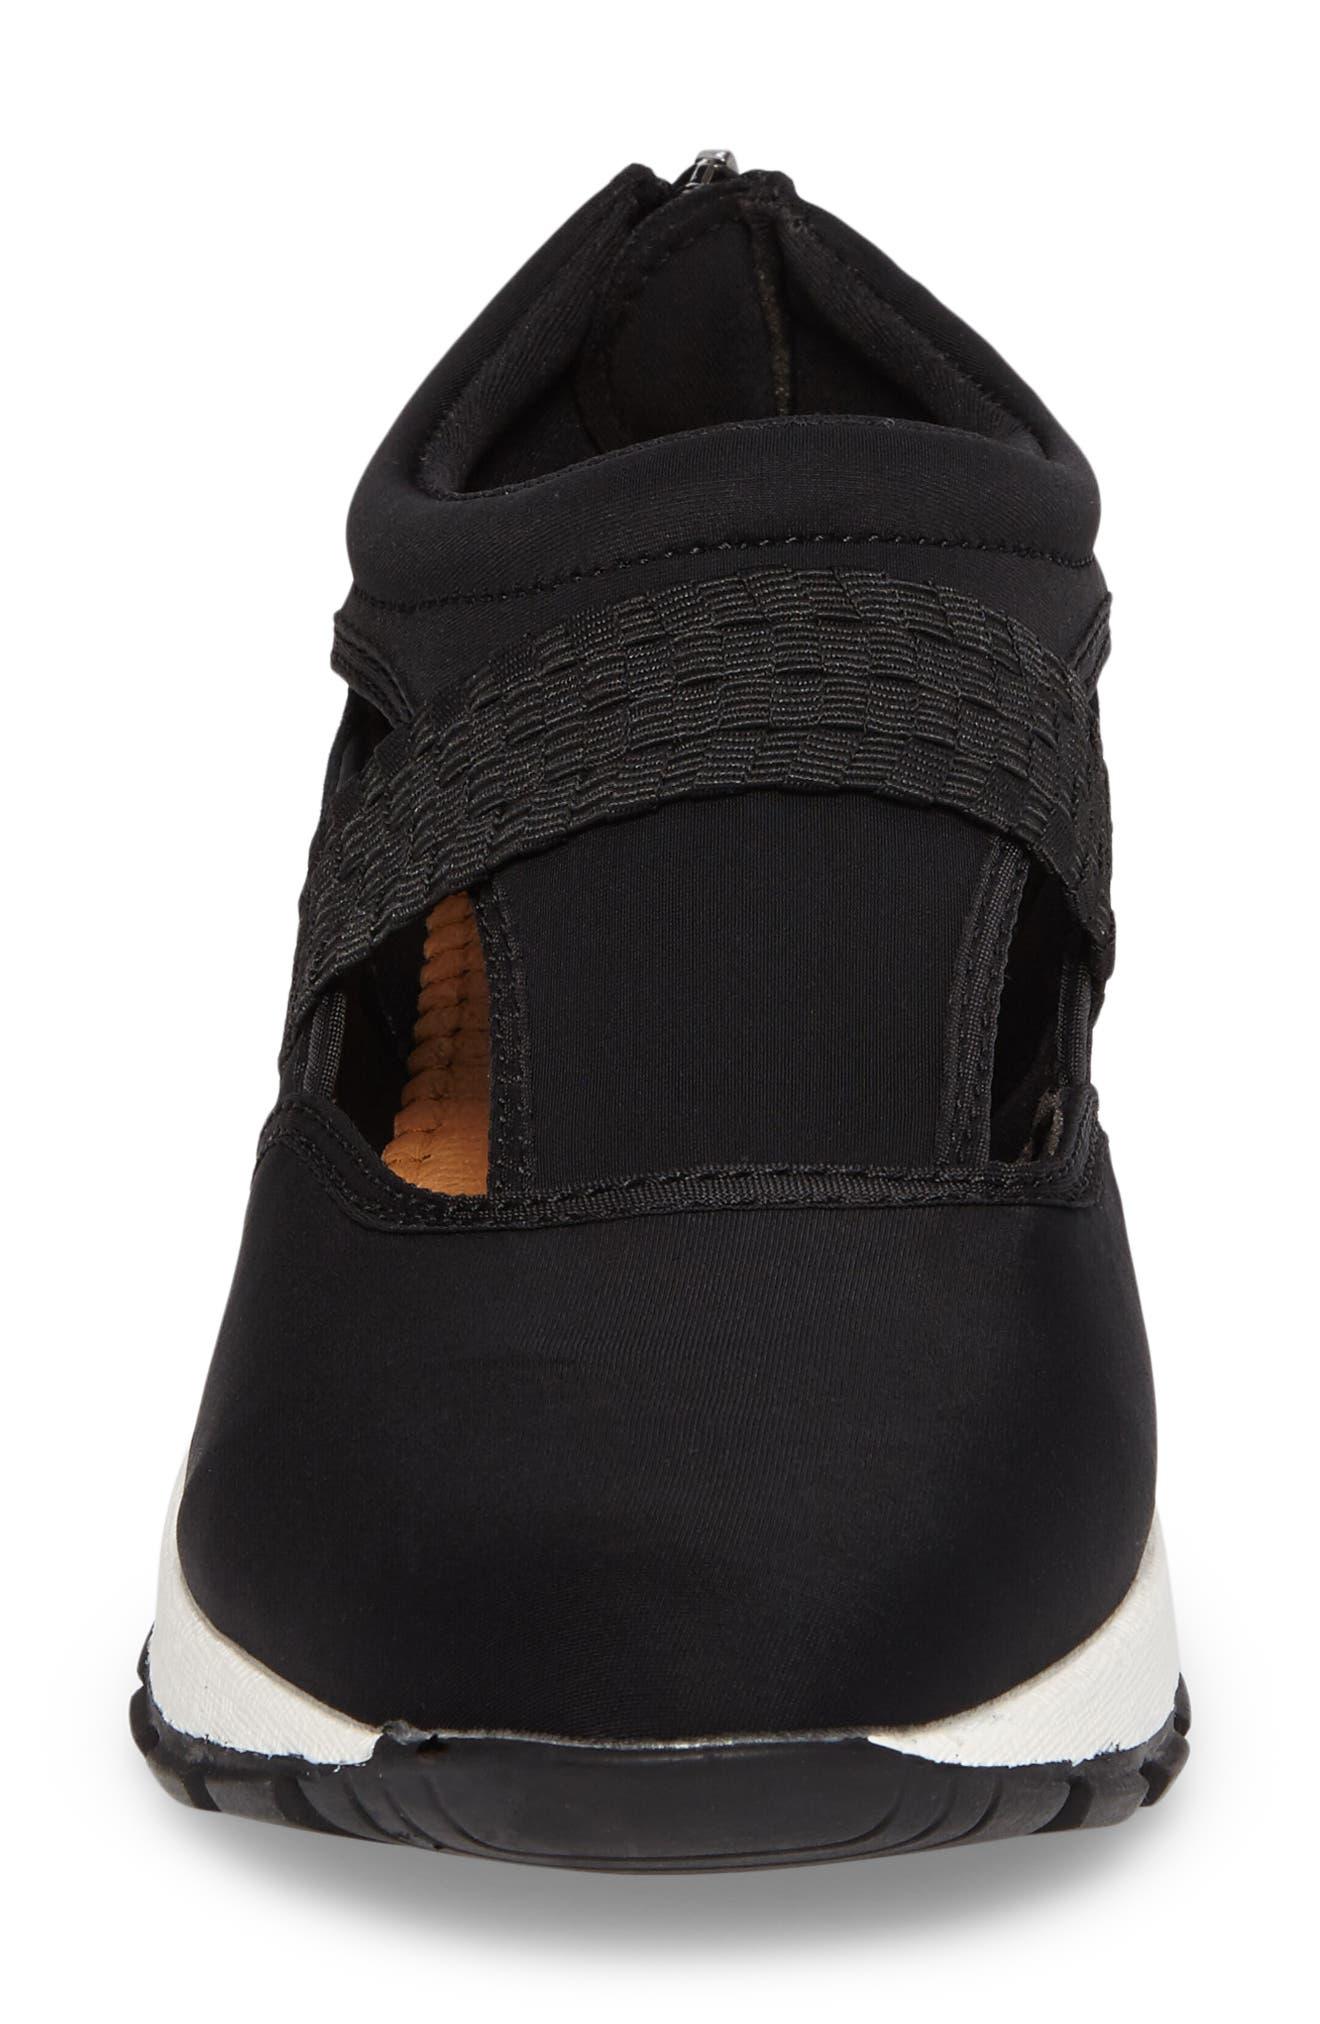 BERNIE MEV., Bernie Mev Janelle Sneaker, Alternate thumbnail 4, color, BLACK FABRIC